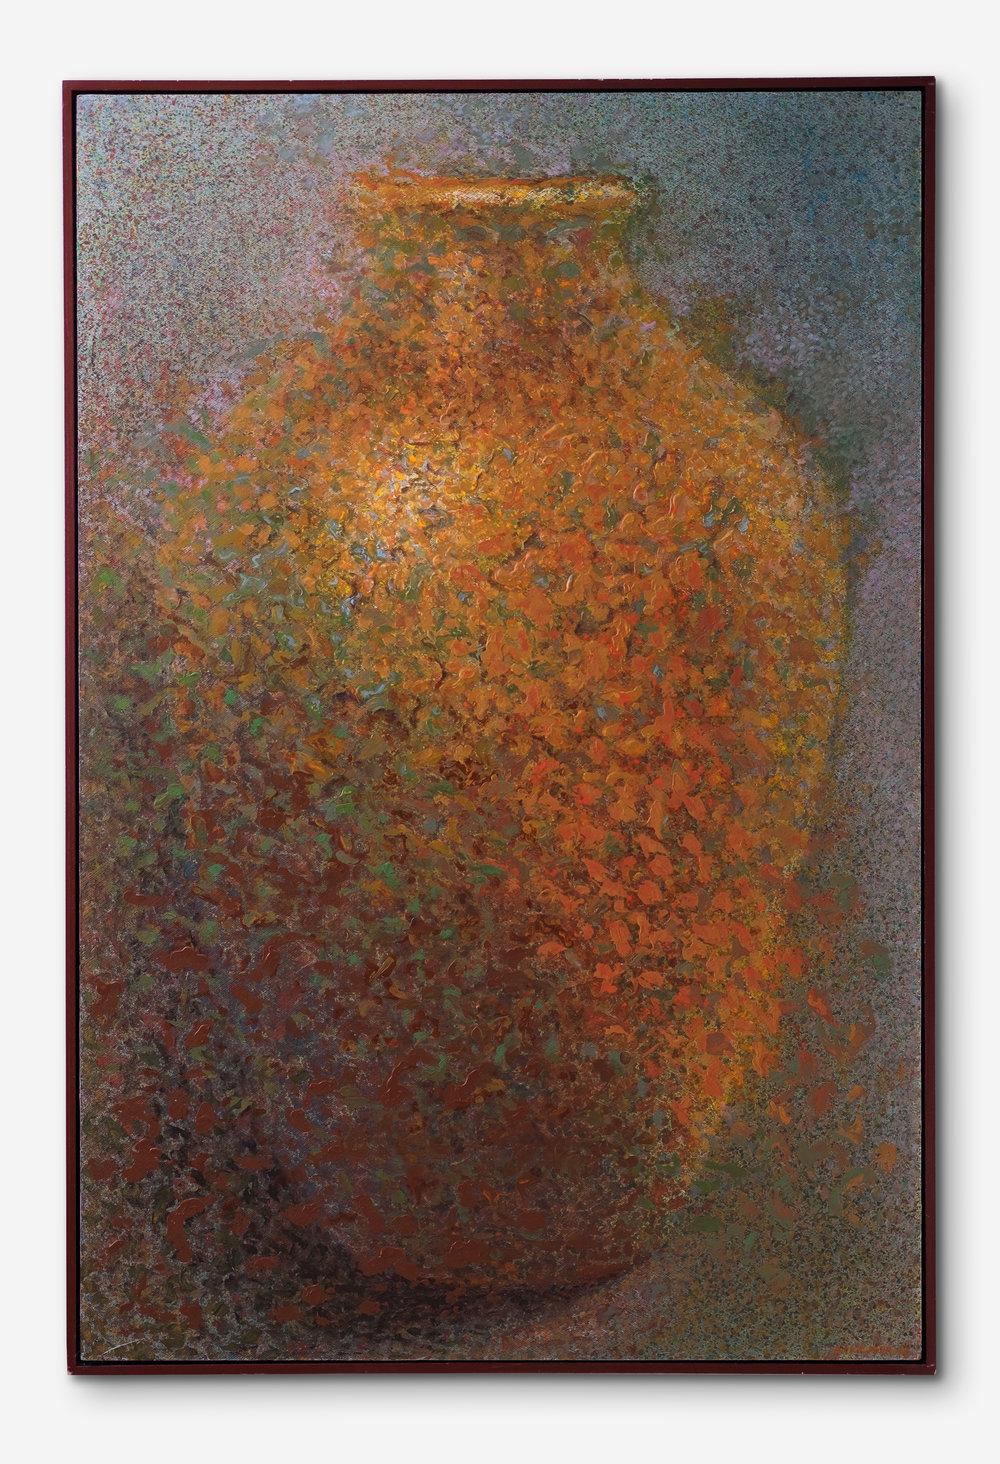 Earth Vase #38